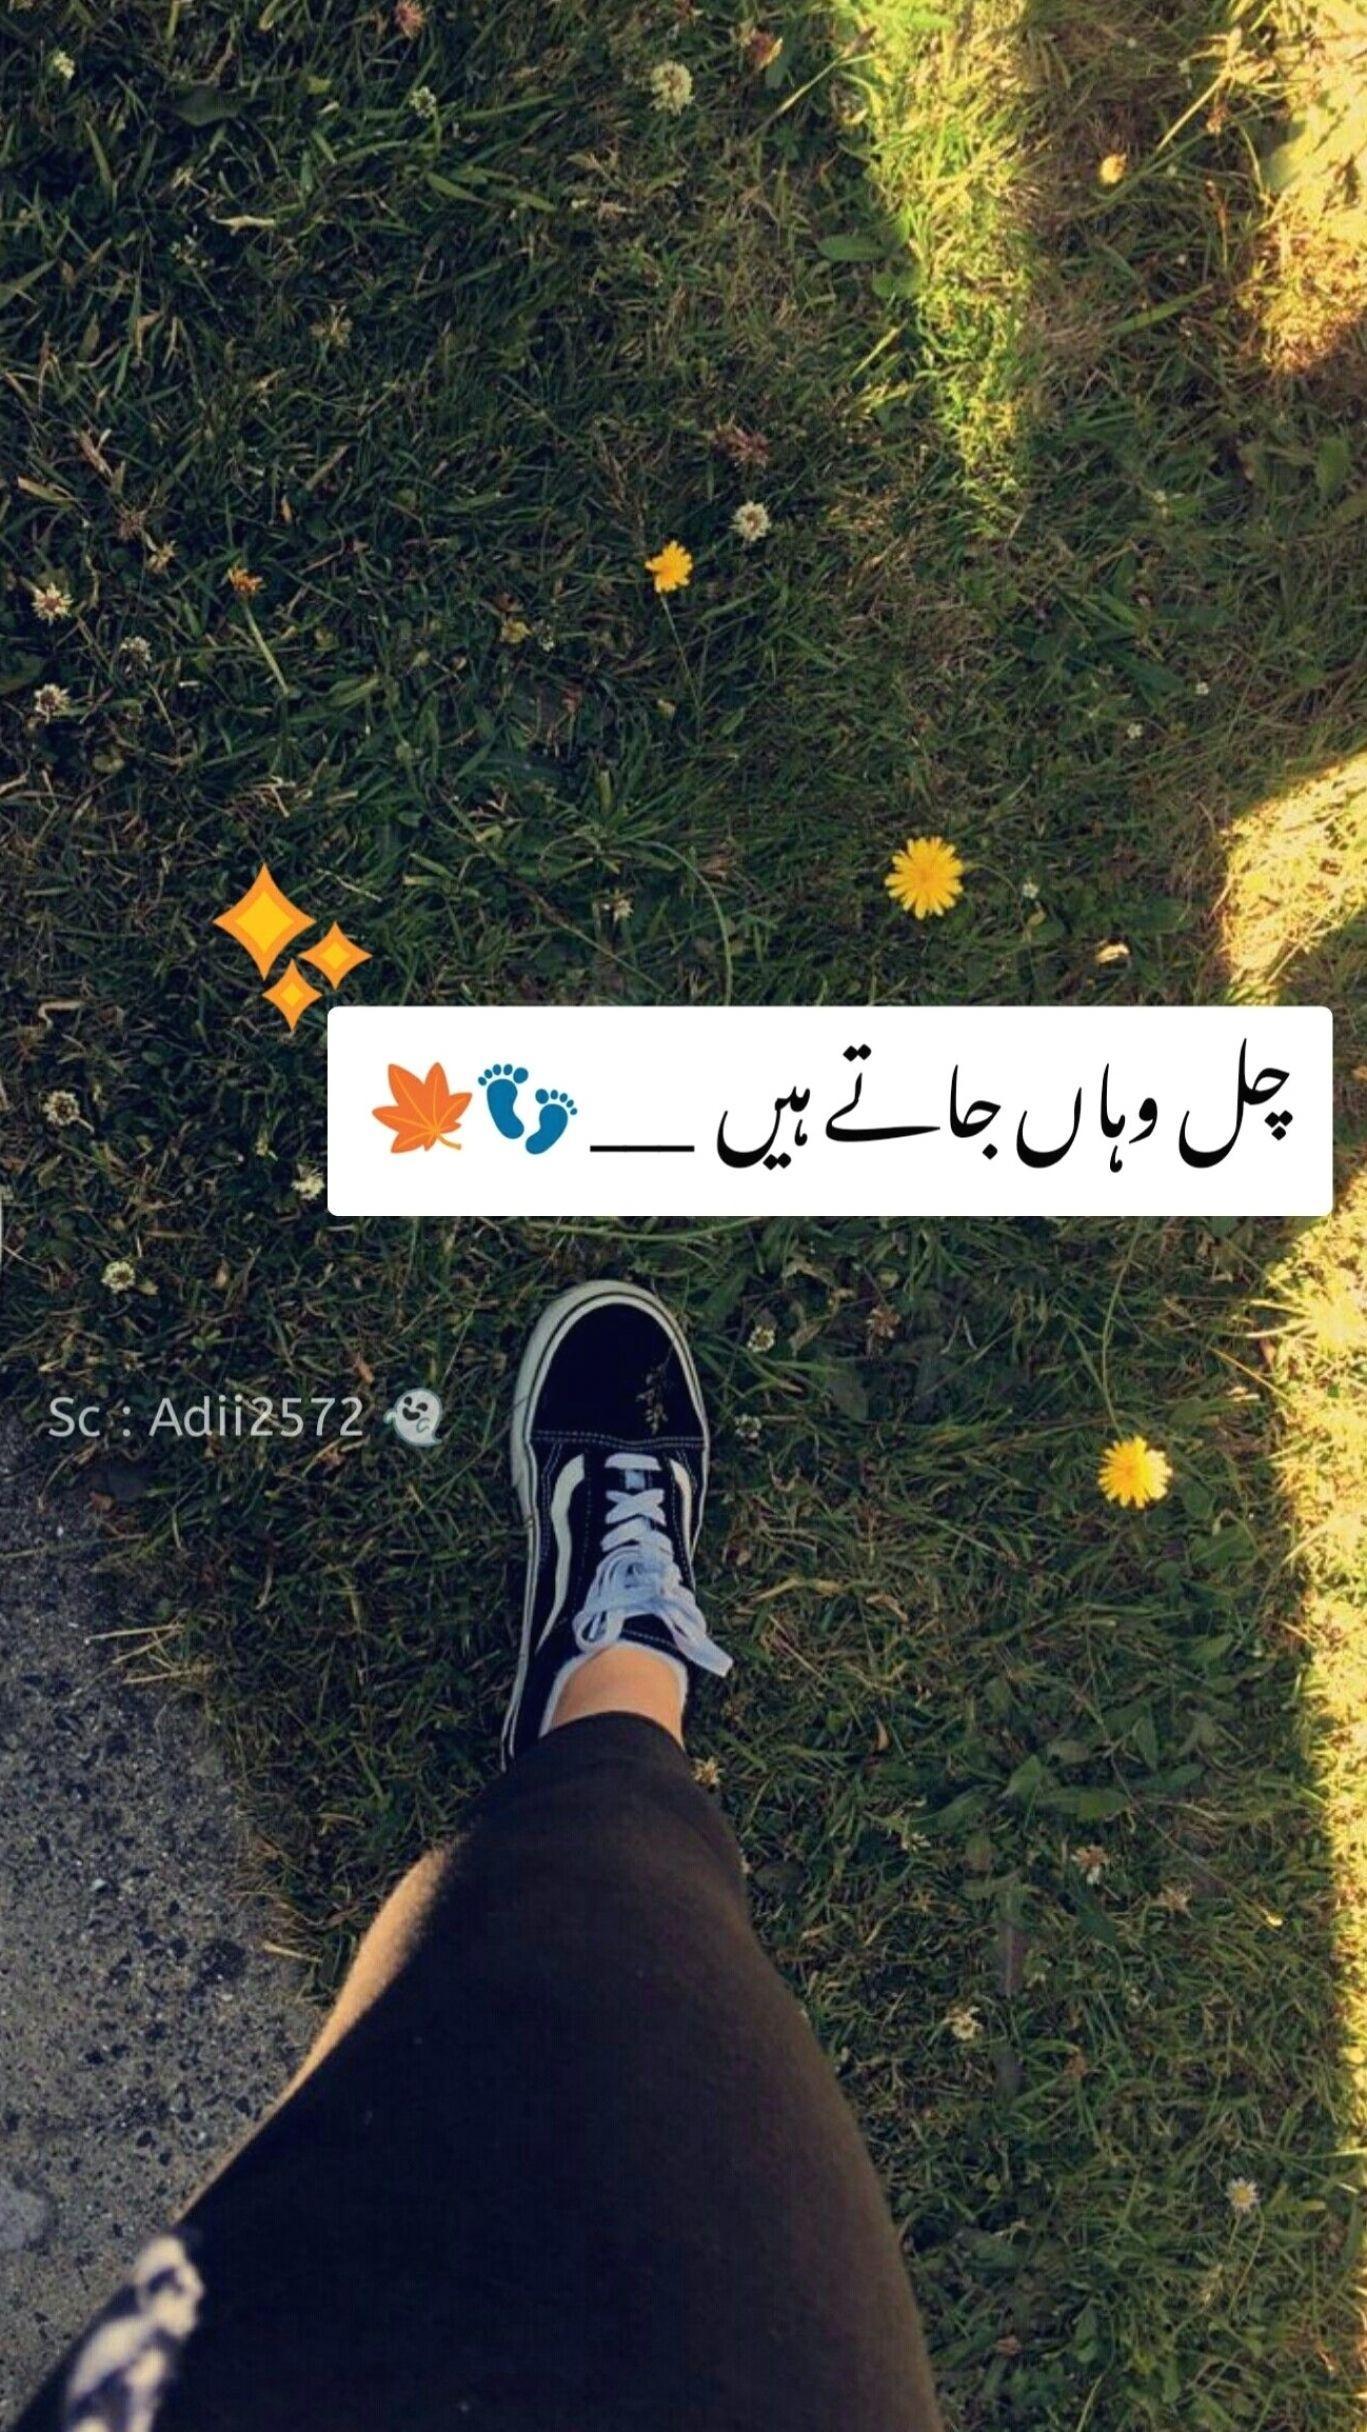 Urdu In 2021 Short Instagram Quotes Love Quotes Poetry One Line Quotes